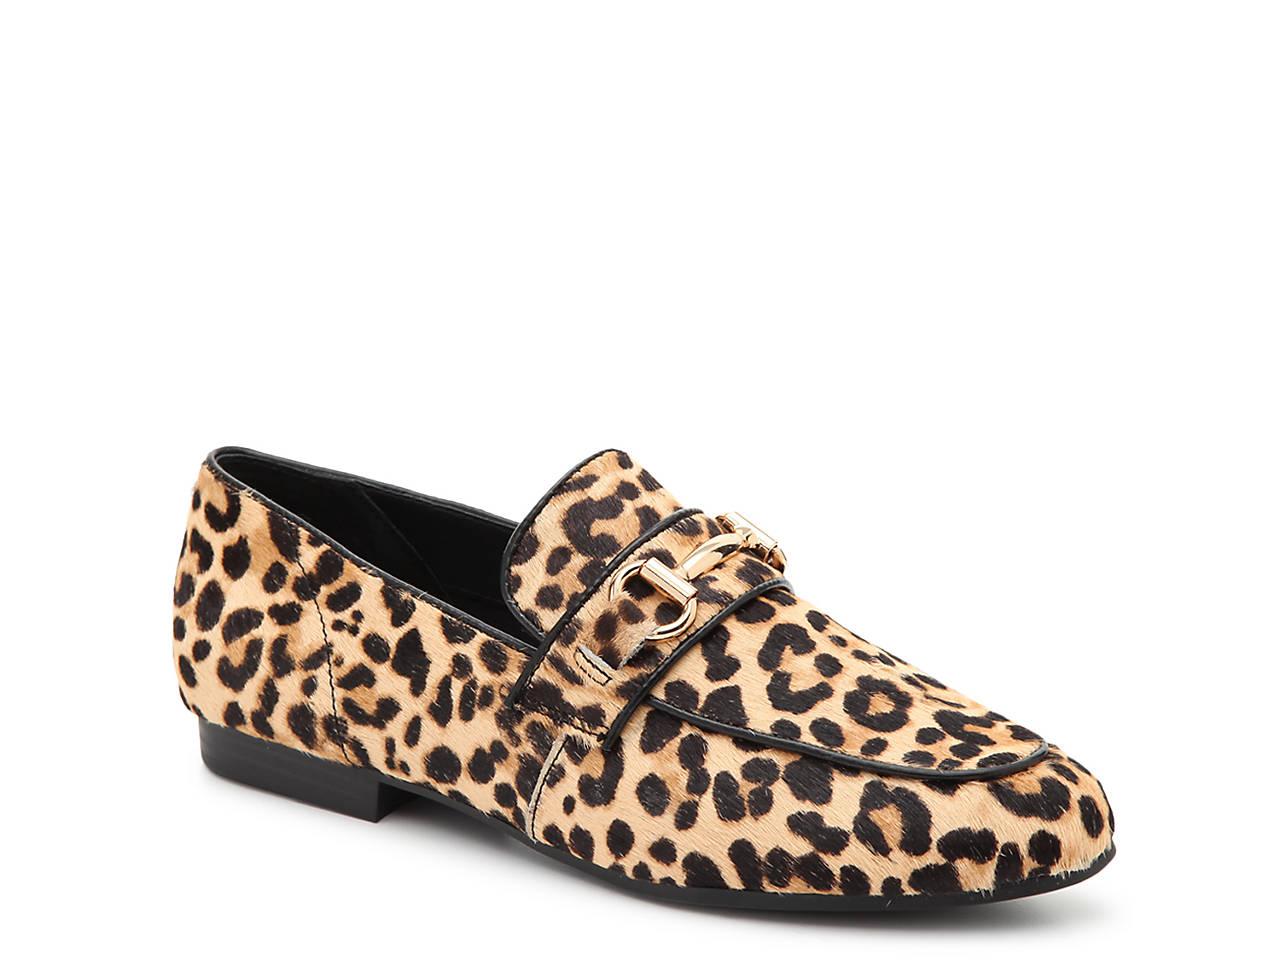 6c16350d36b Steve Madden Kerry Loafer Men s Shoes